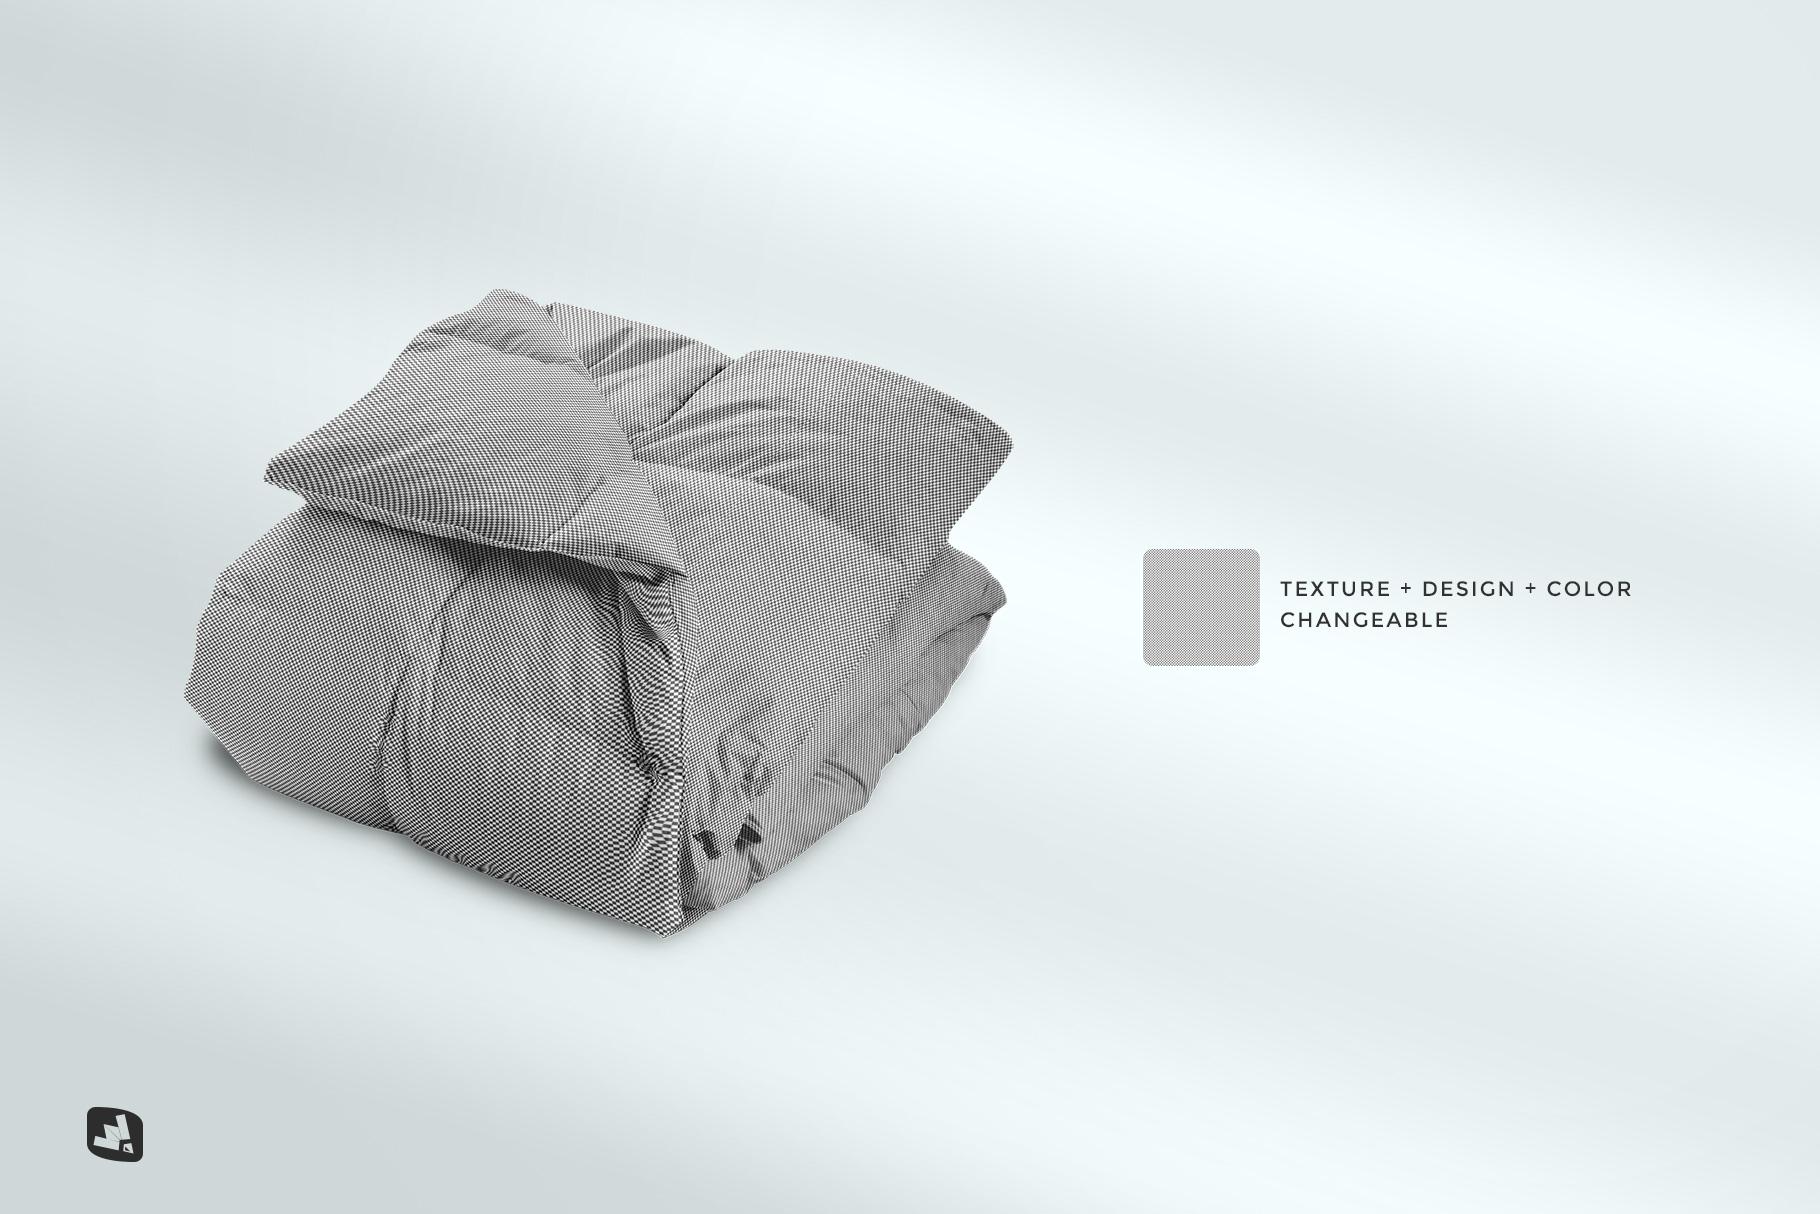 editability of the folded comforter blanket mockup